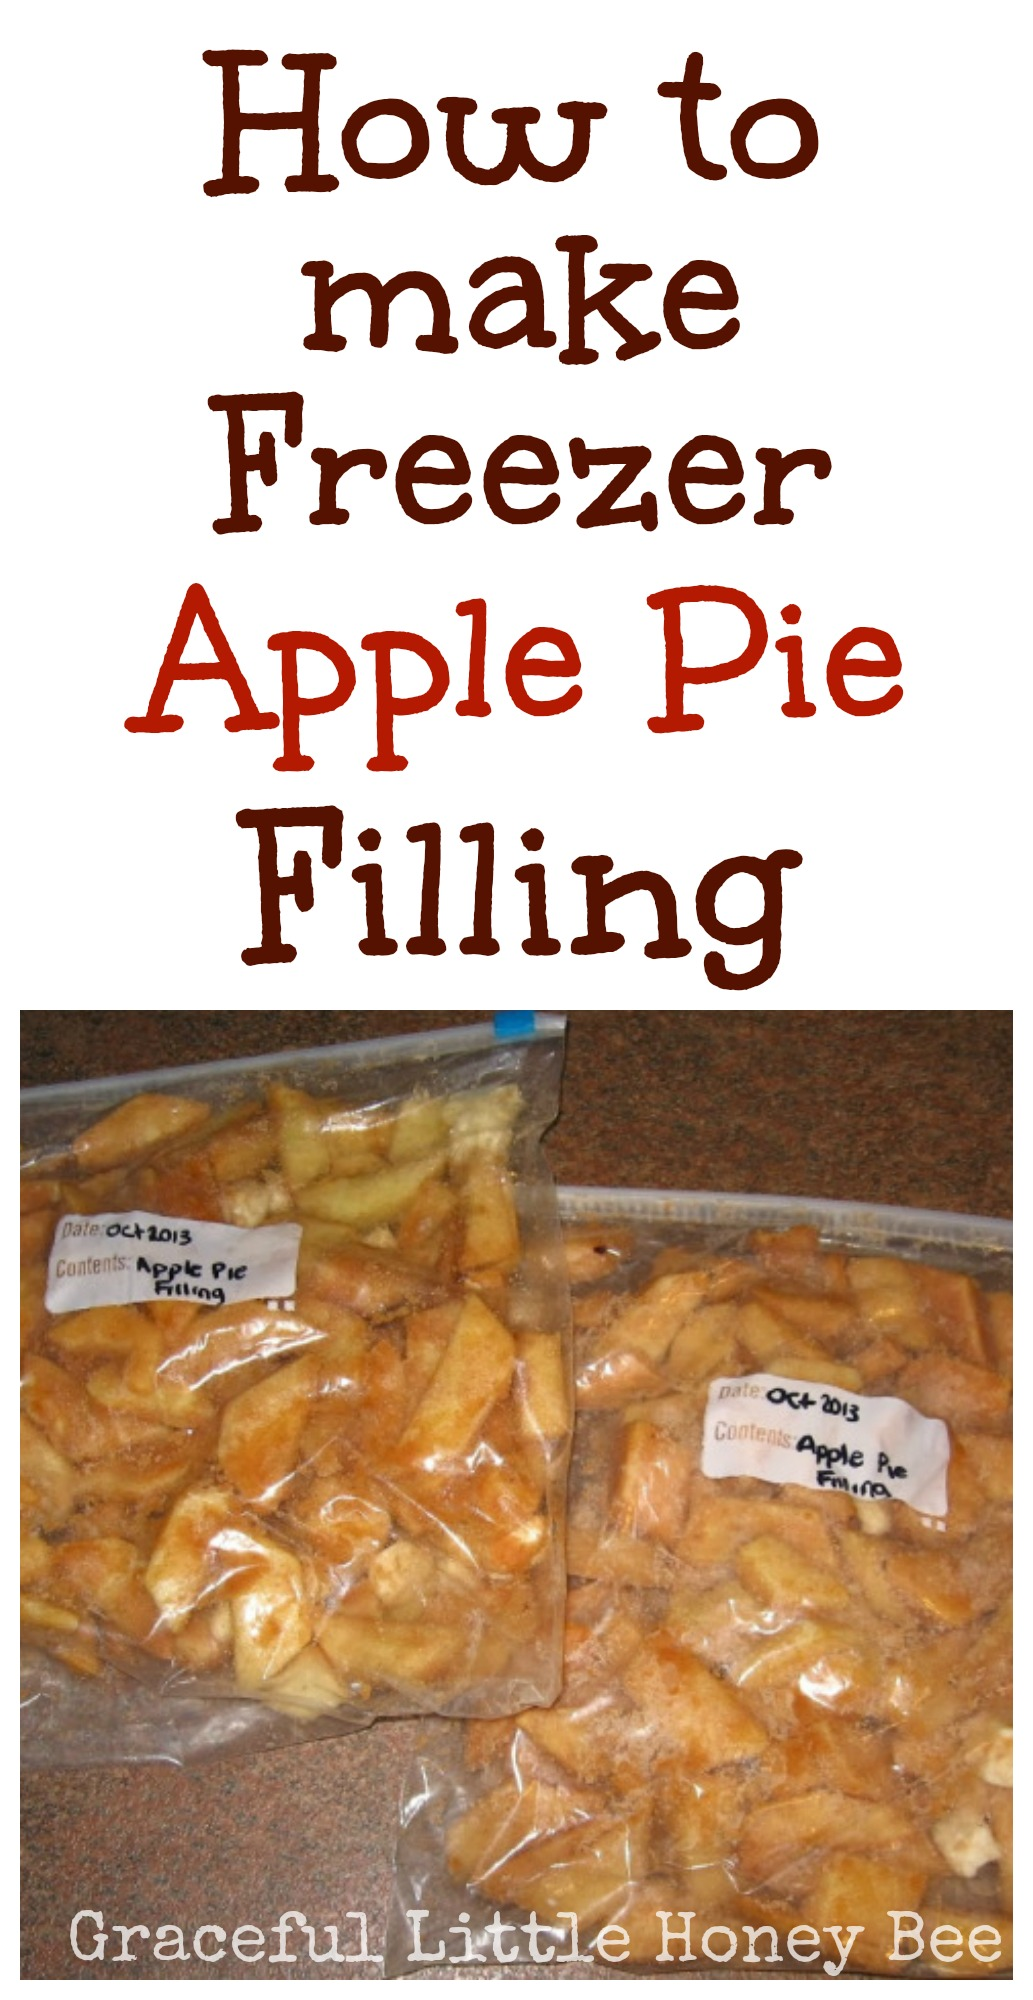 Freezer Apple Pie Filling Video Tutorial Graceful Little Honey Bee